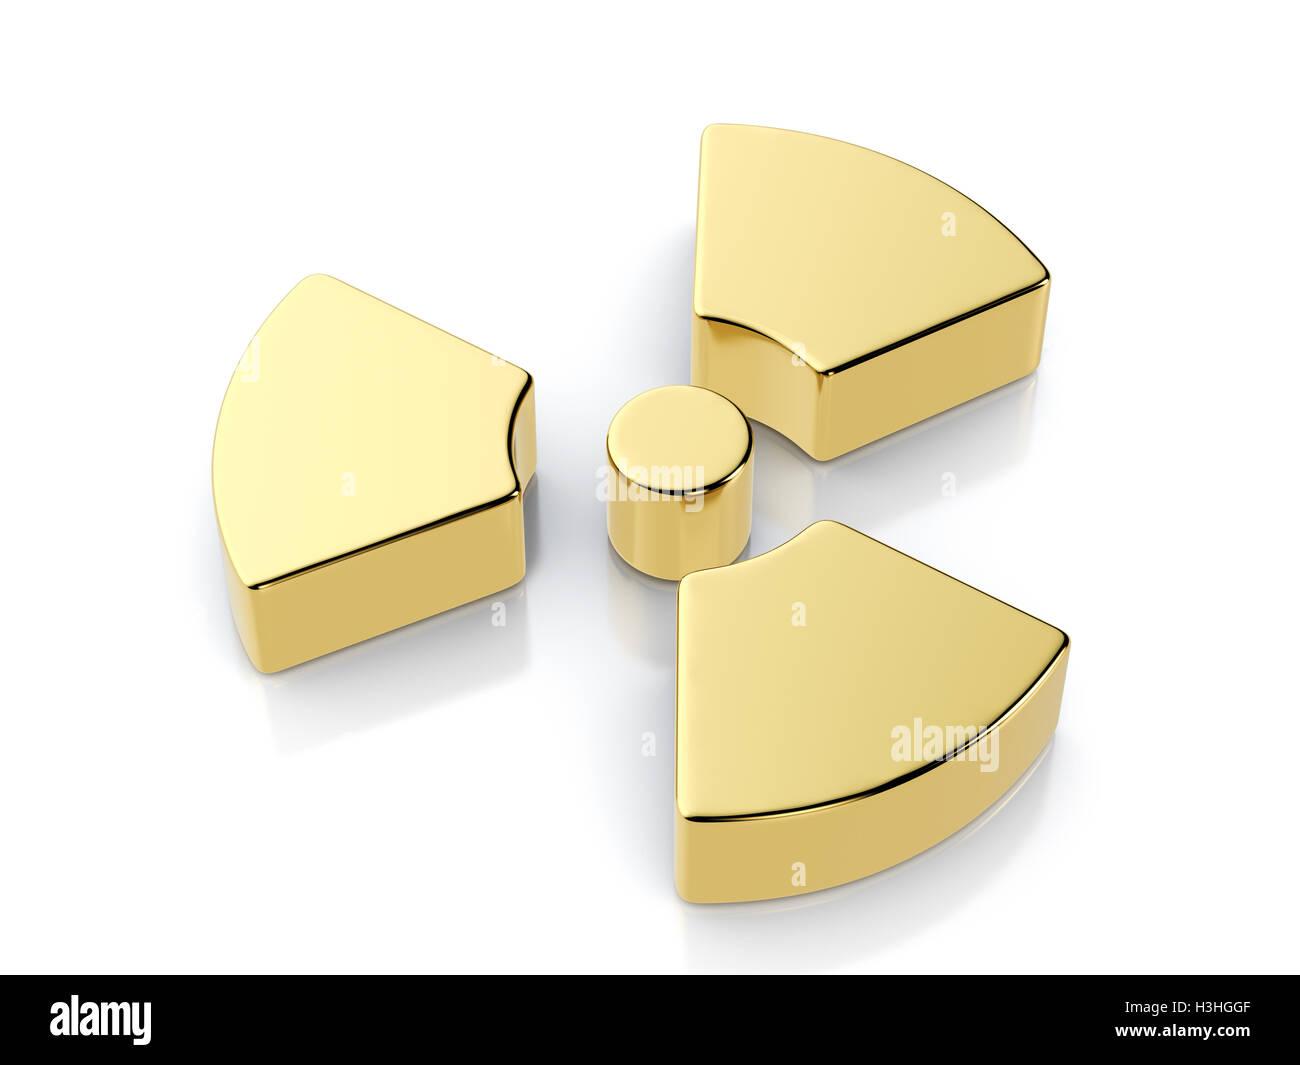 Golden radiation symbol on a white background. - Stock Image